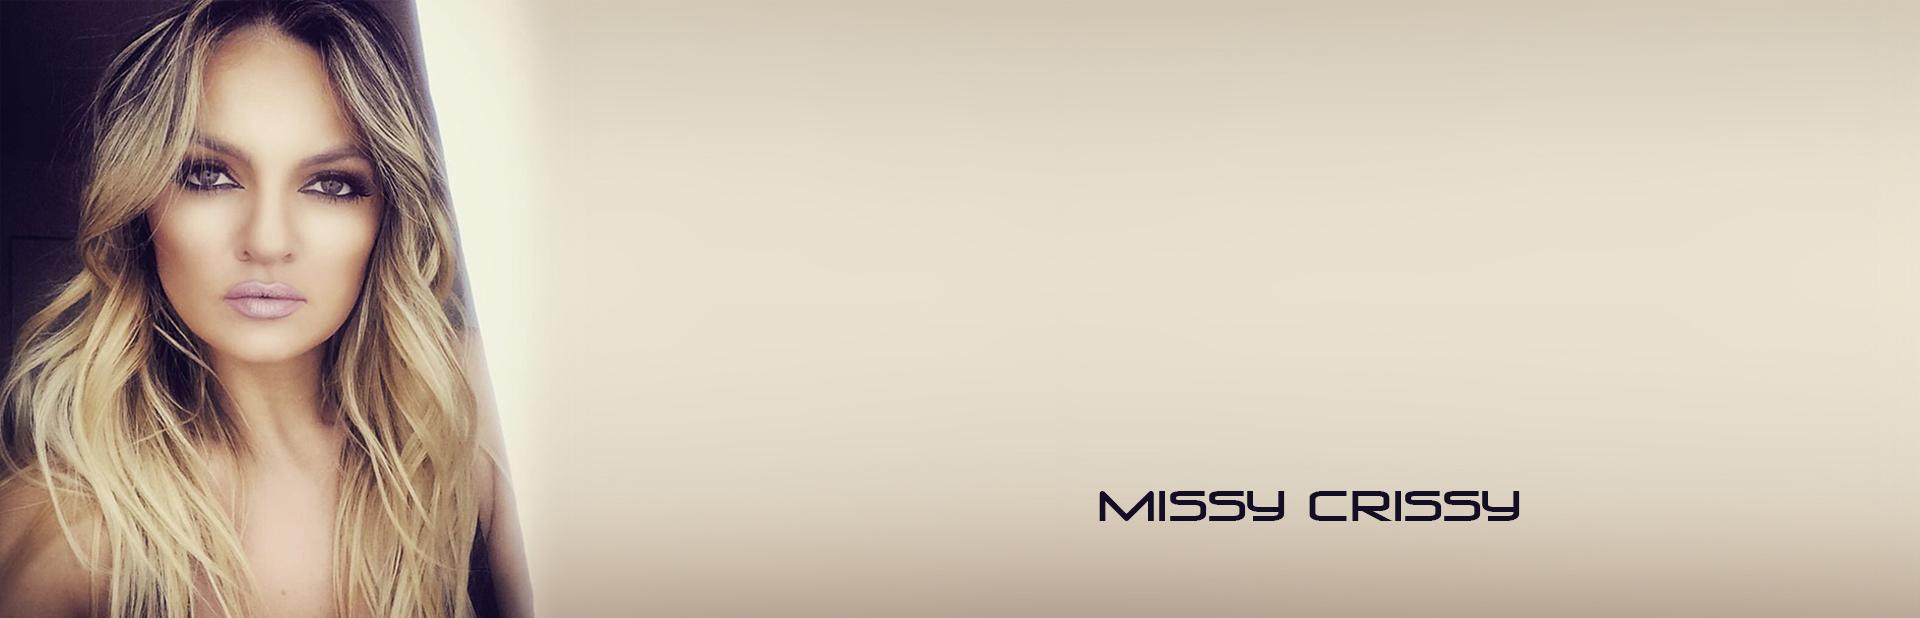 missycrissy-01